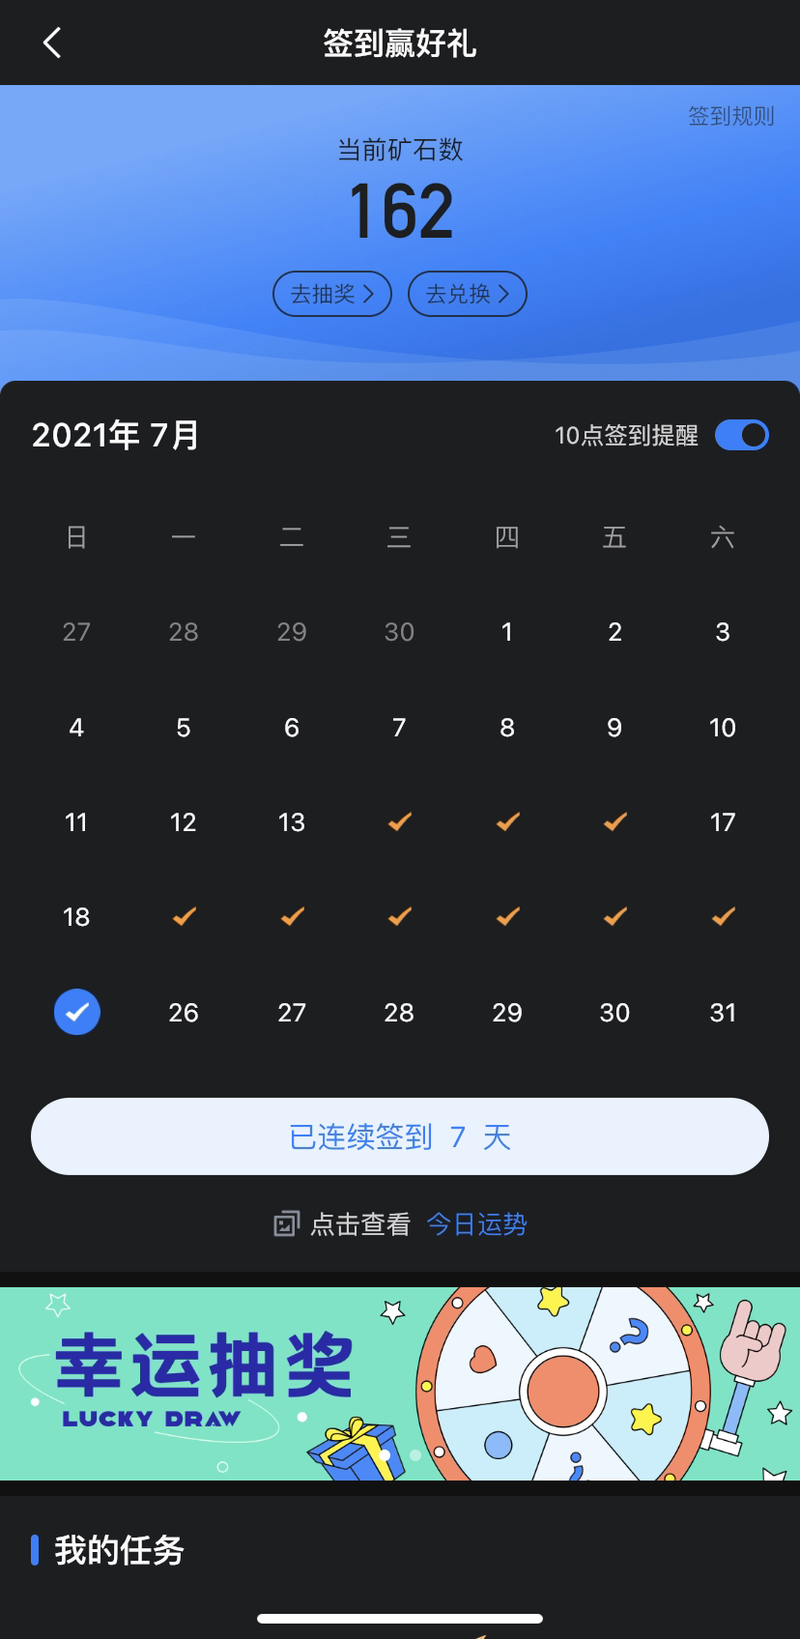 Coffee_C于2021-07-25 00:26发布的图片